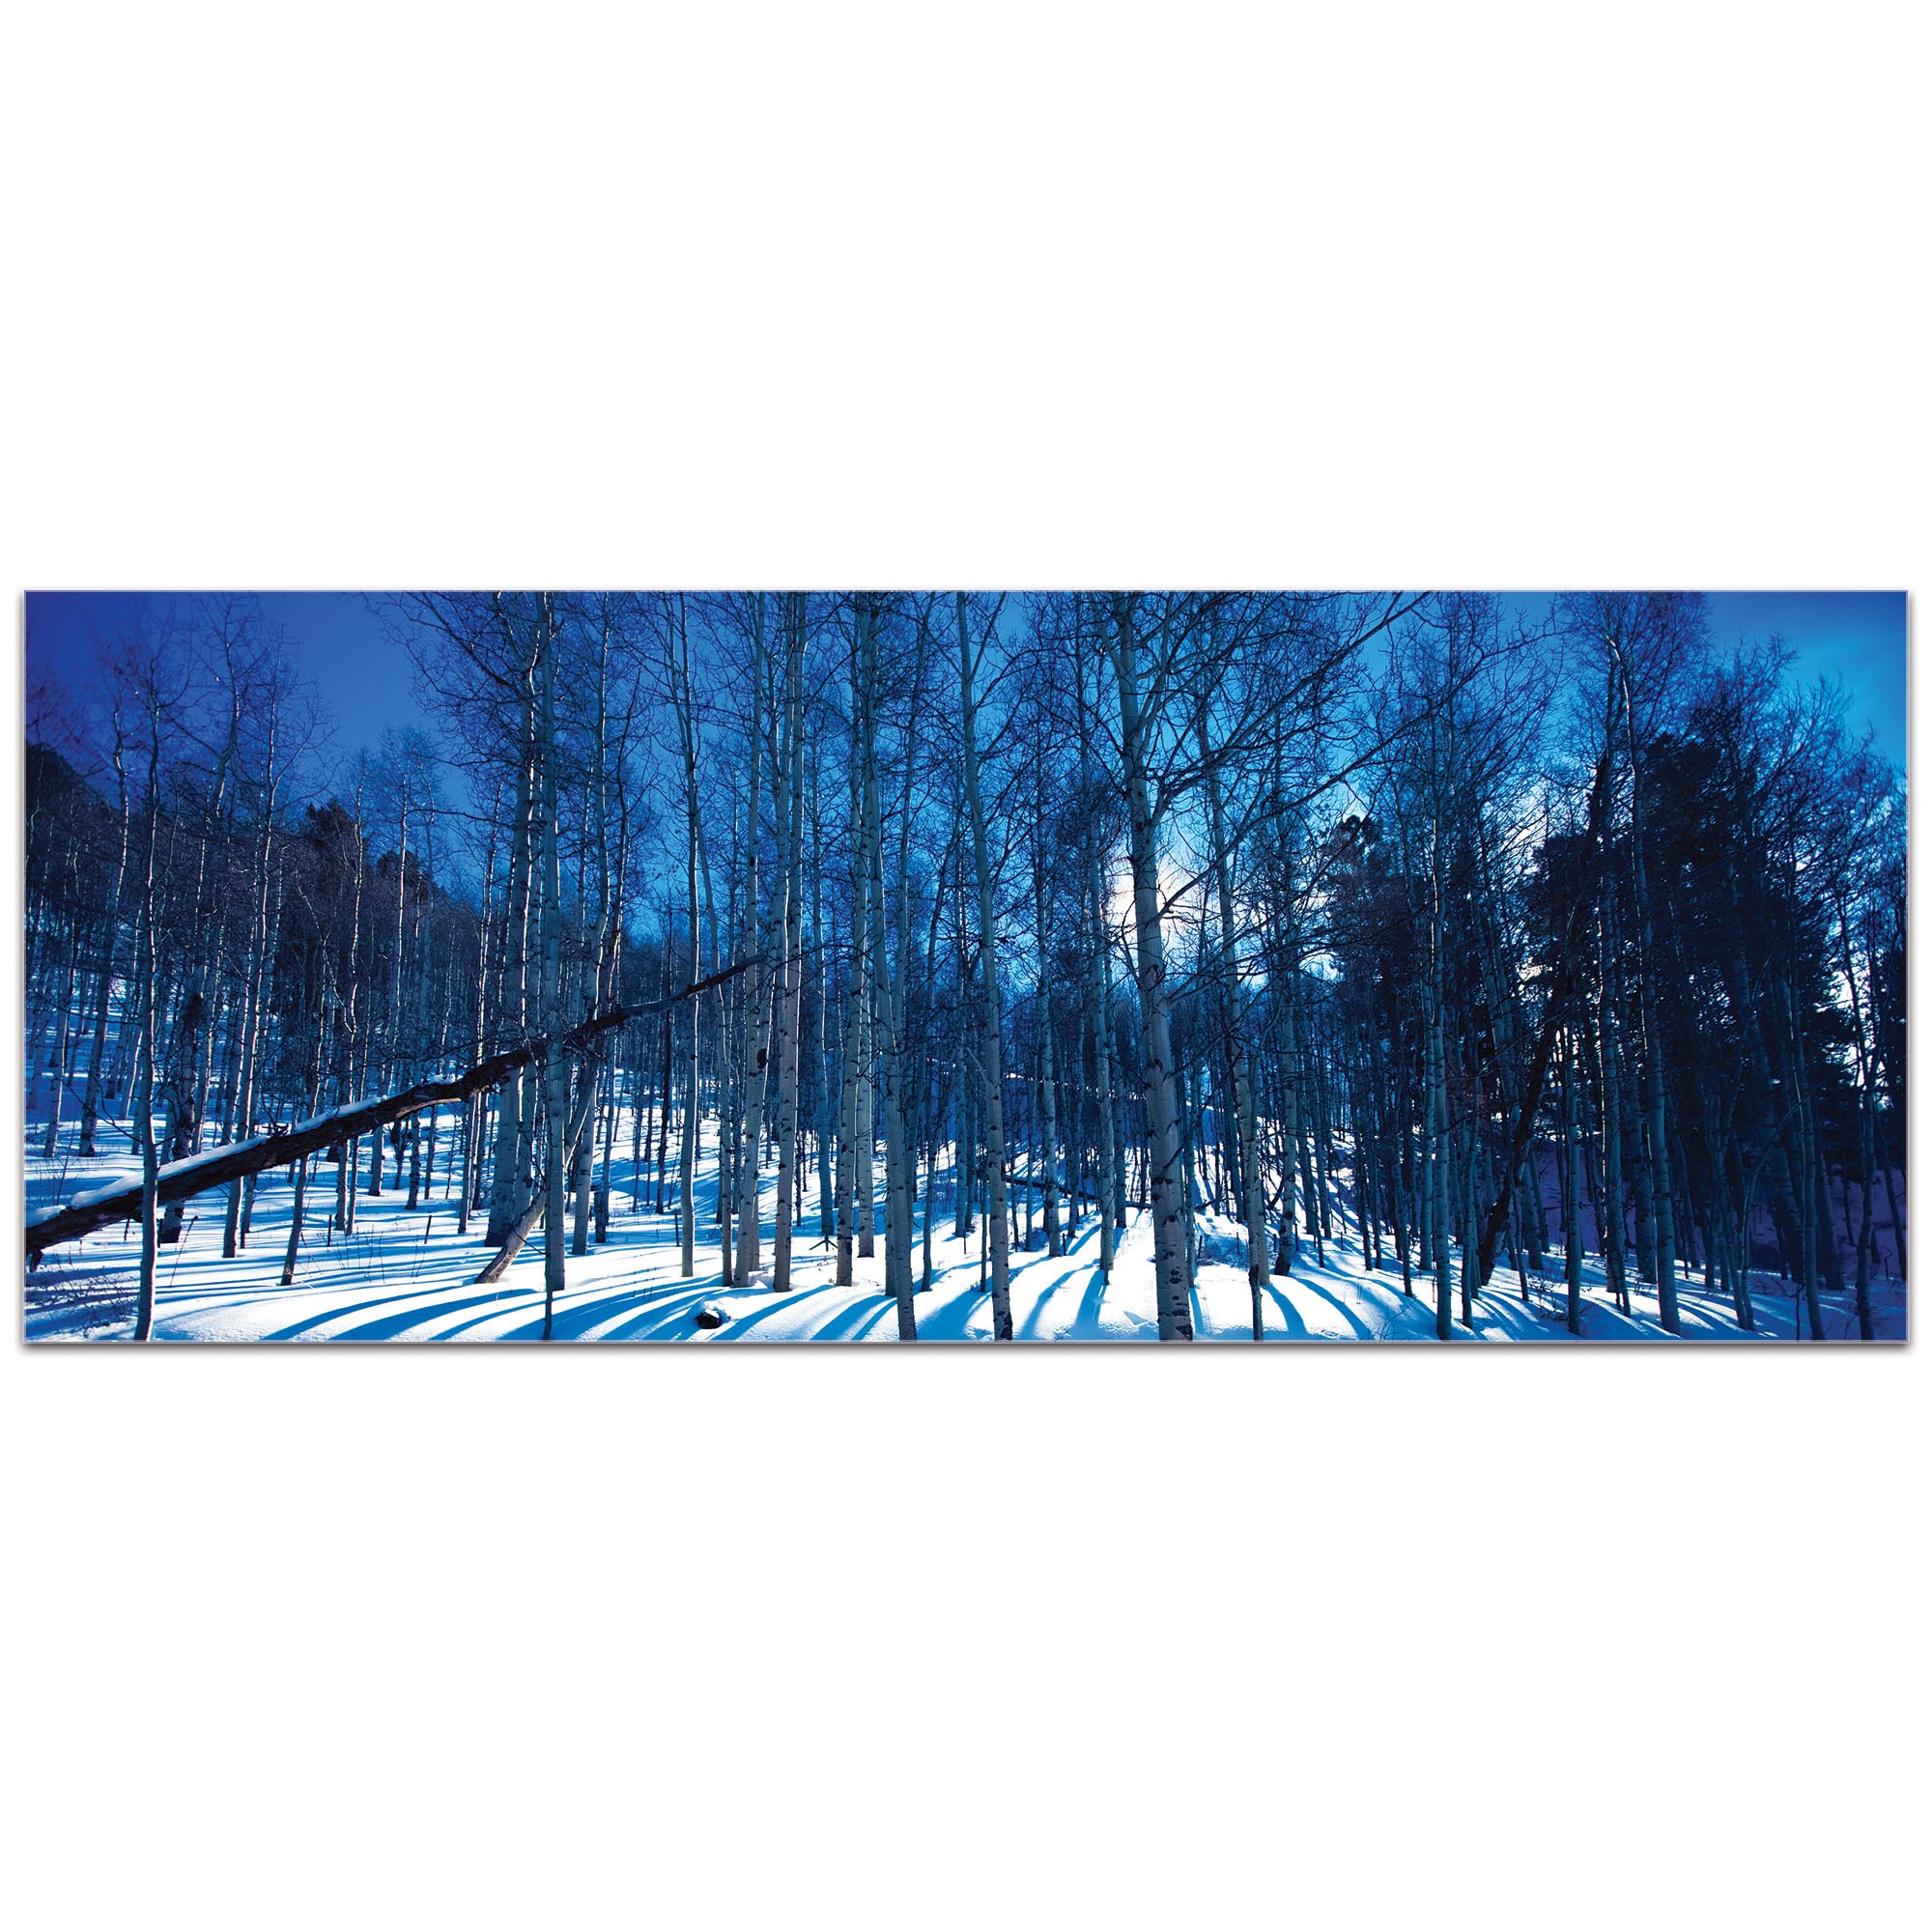 Landscape Photography 'Aspen Blues' - Winter Scene Art on Metal or Plexiglass - Image 2